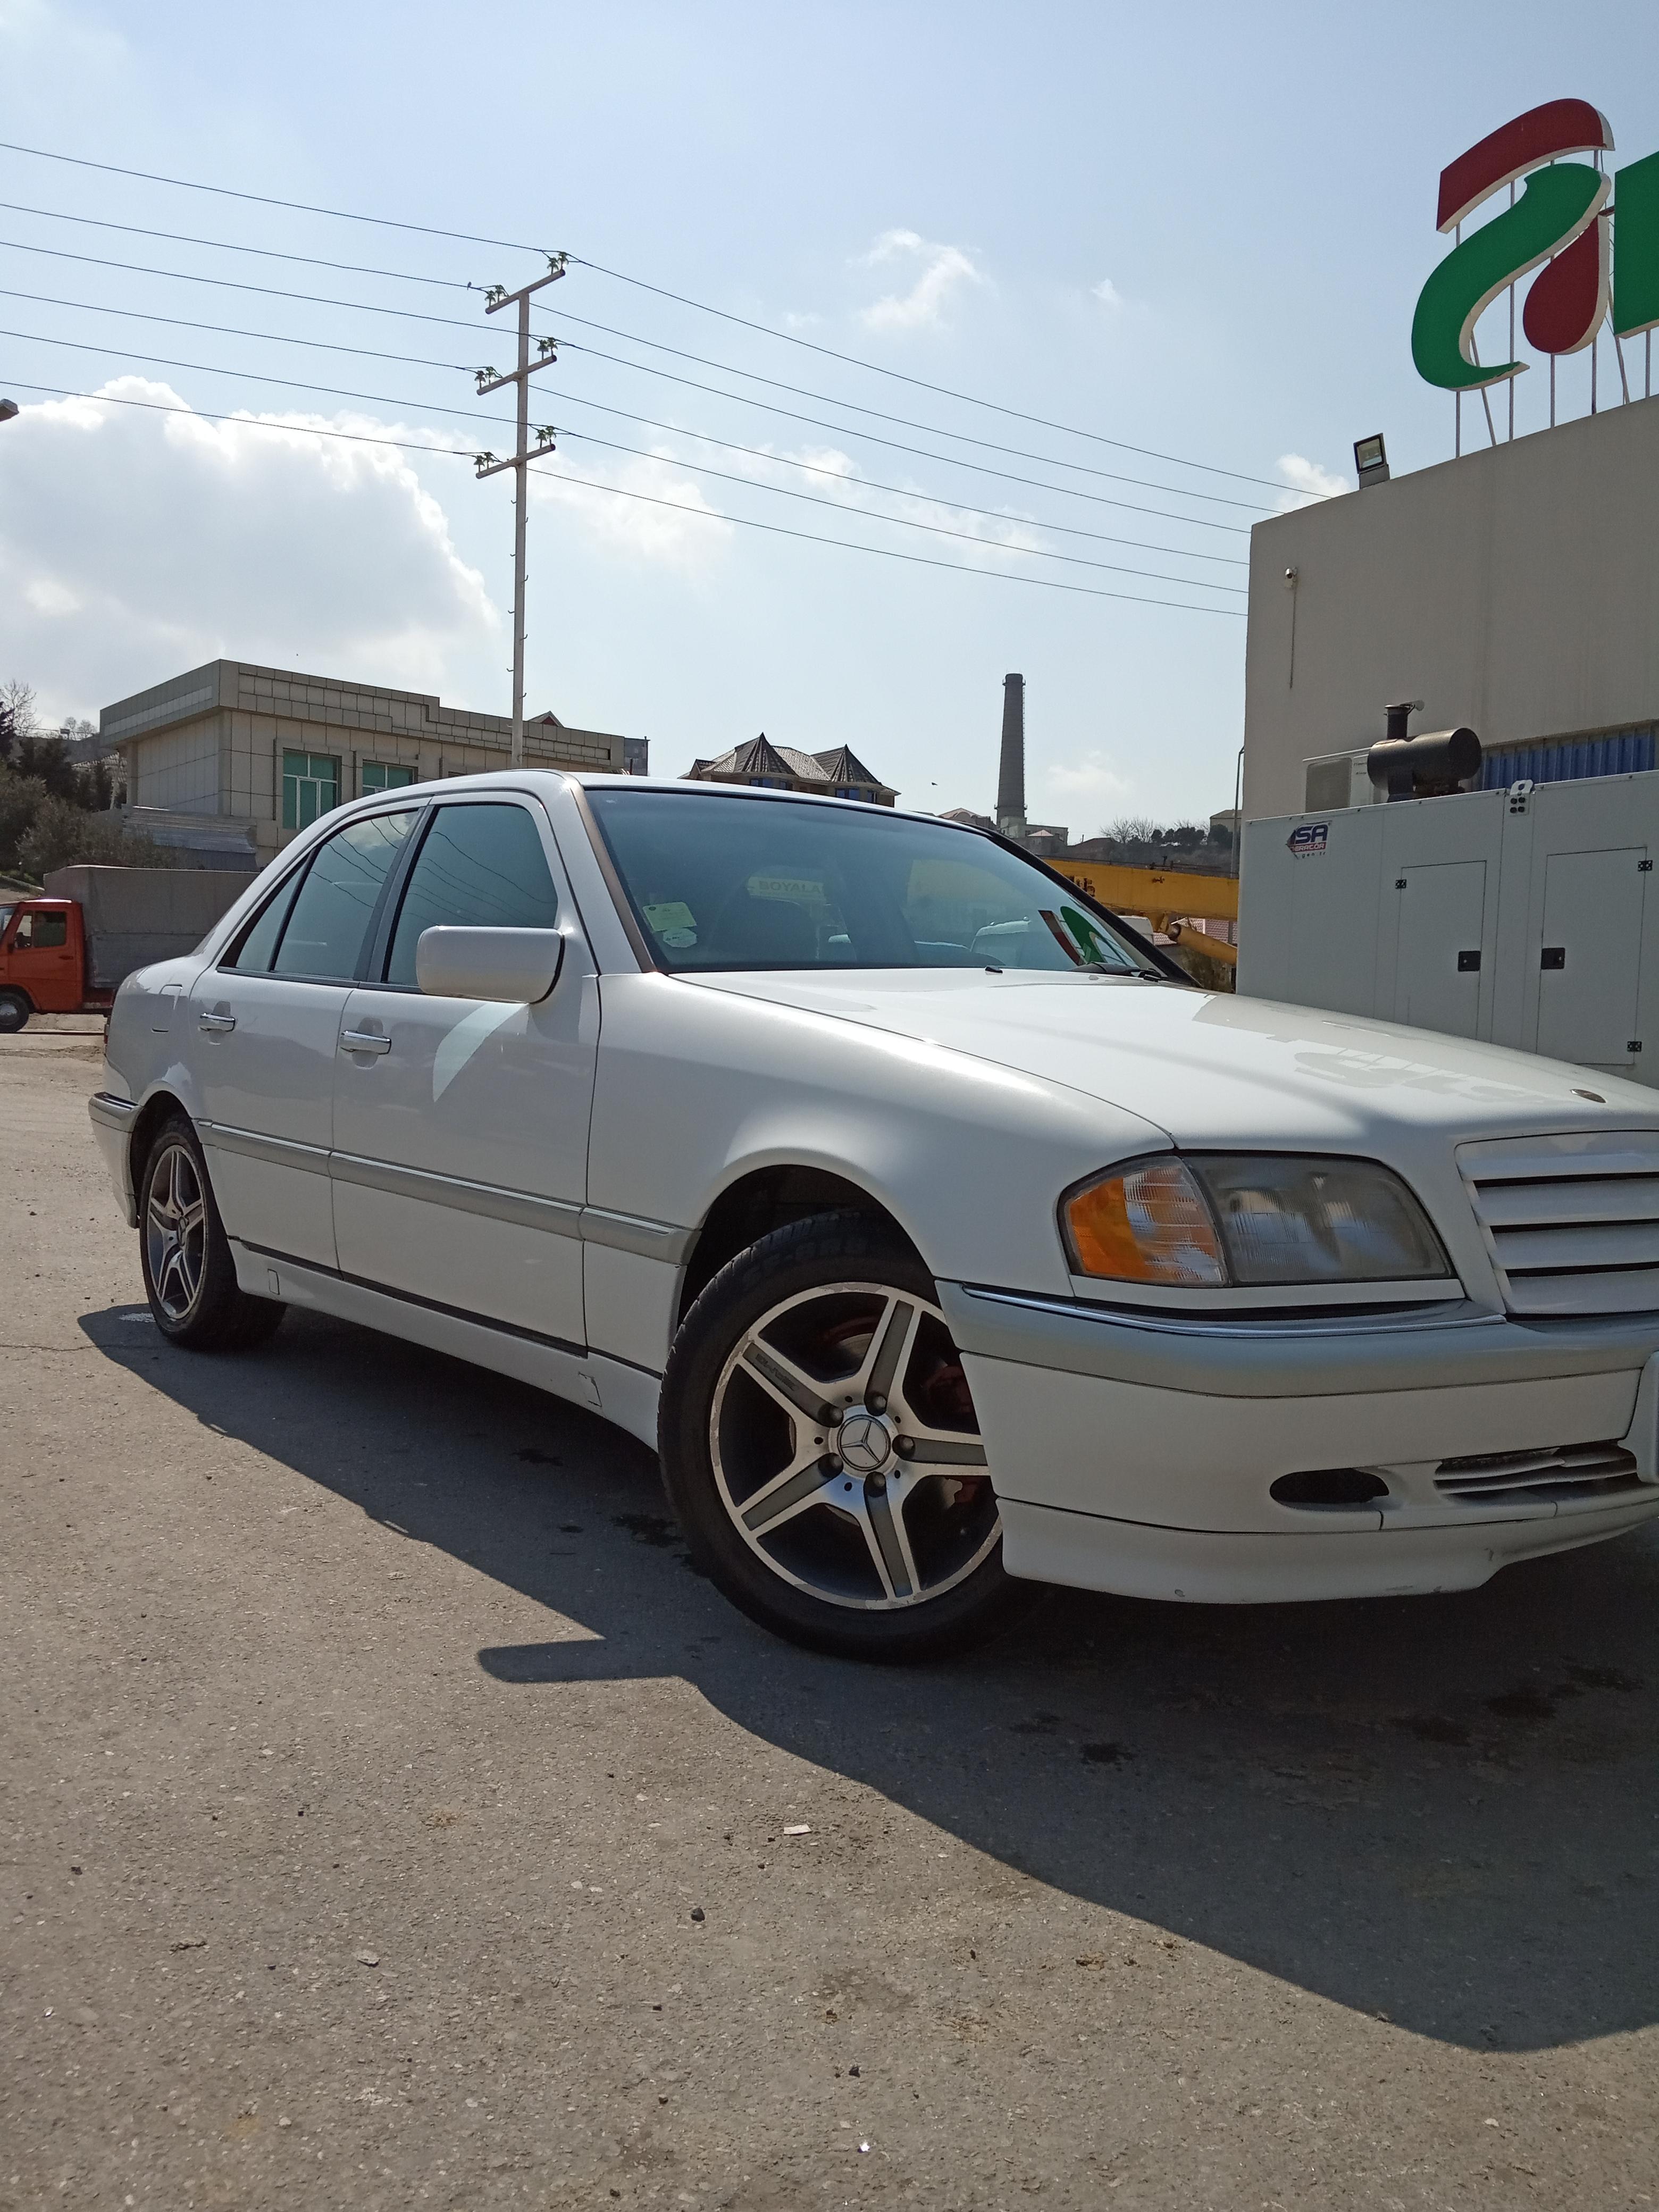 Mercedes-Benz C 230 2.3(lt) 1998 Second hand  $7250